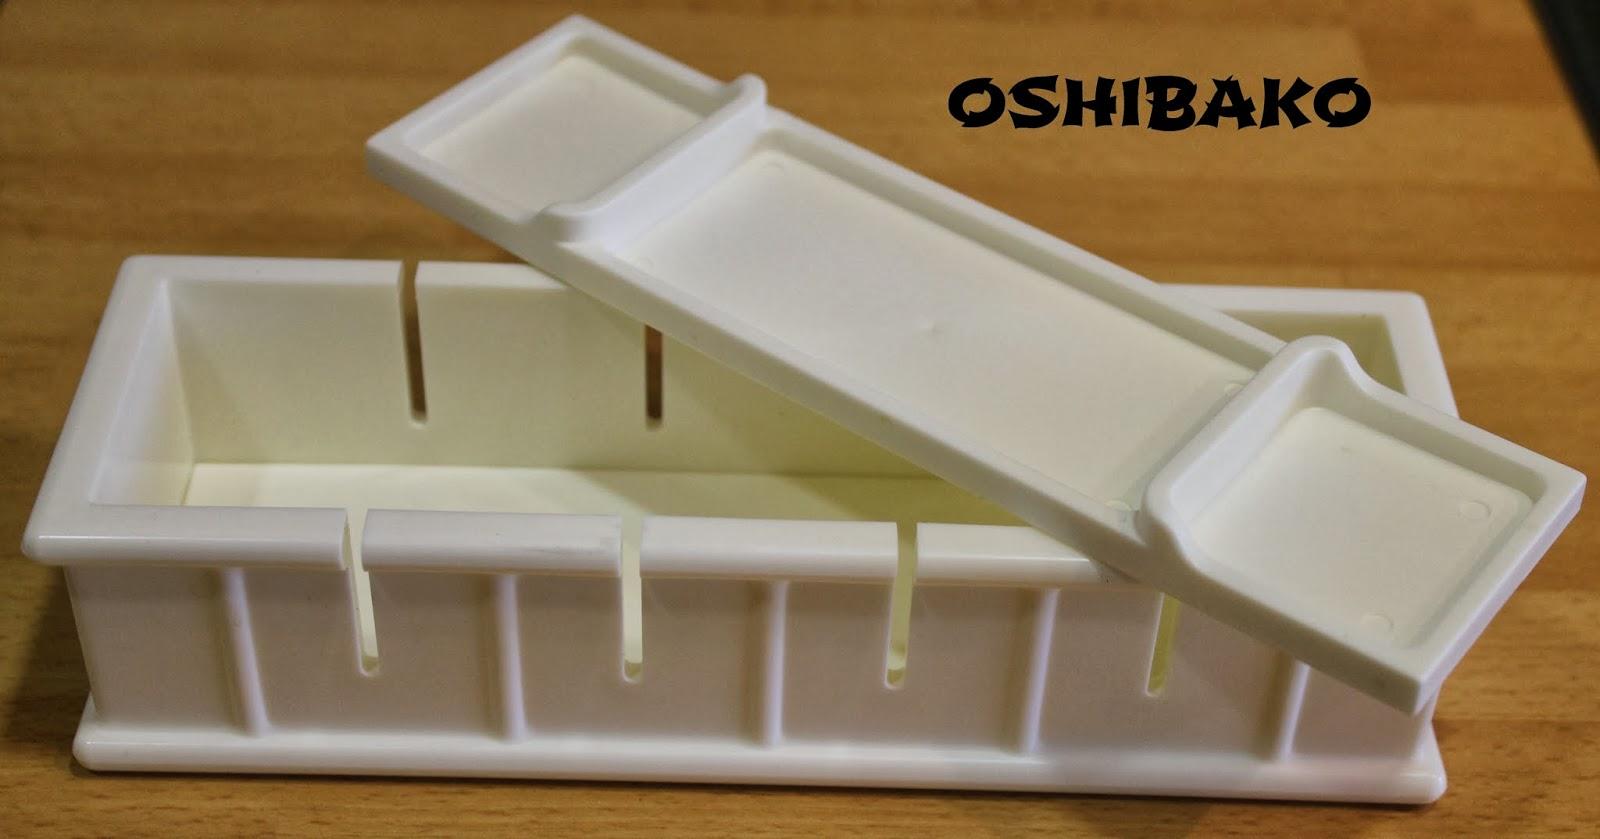 Oshibako